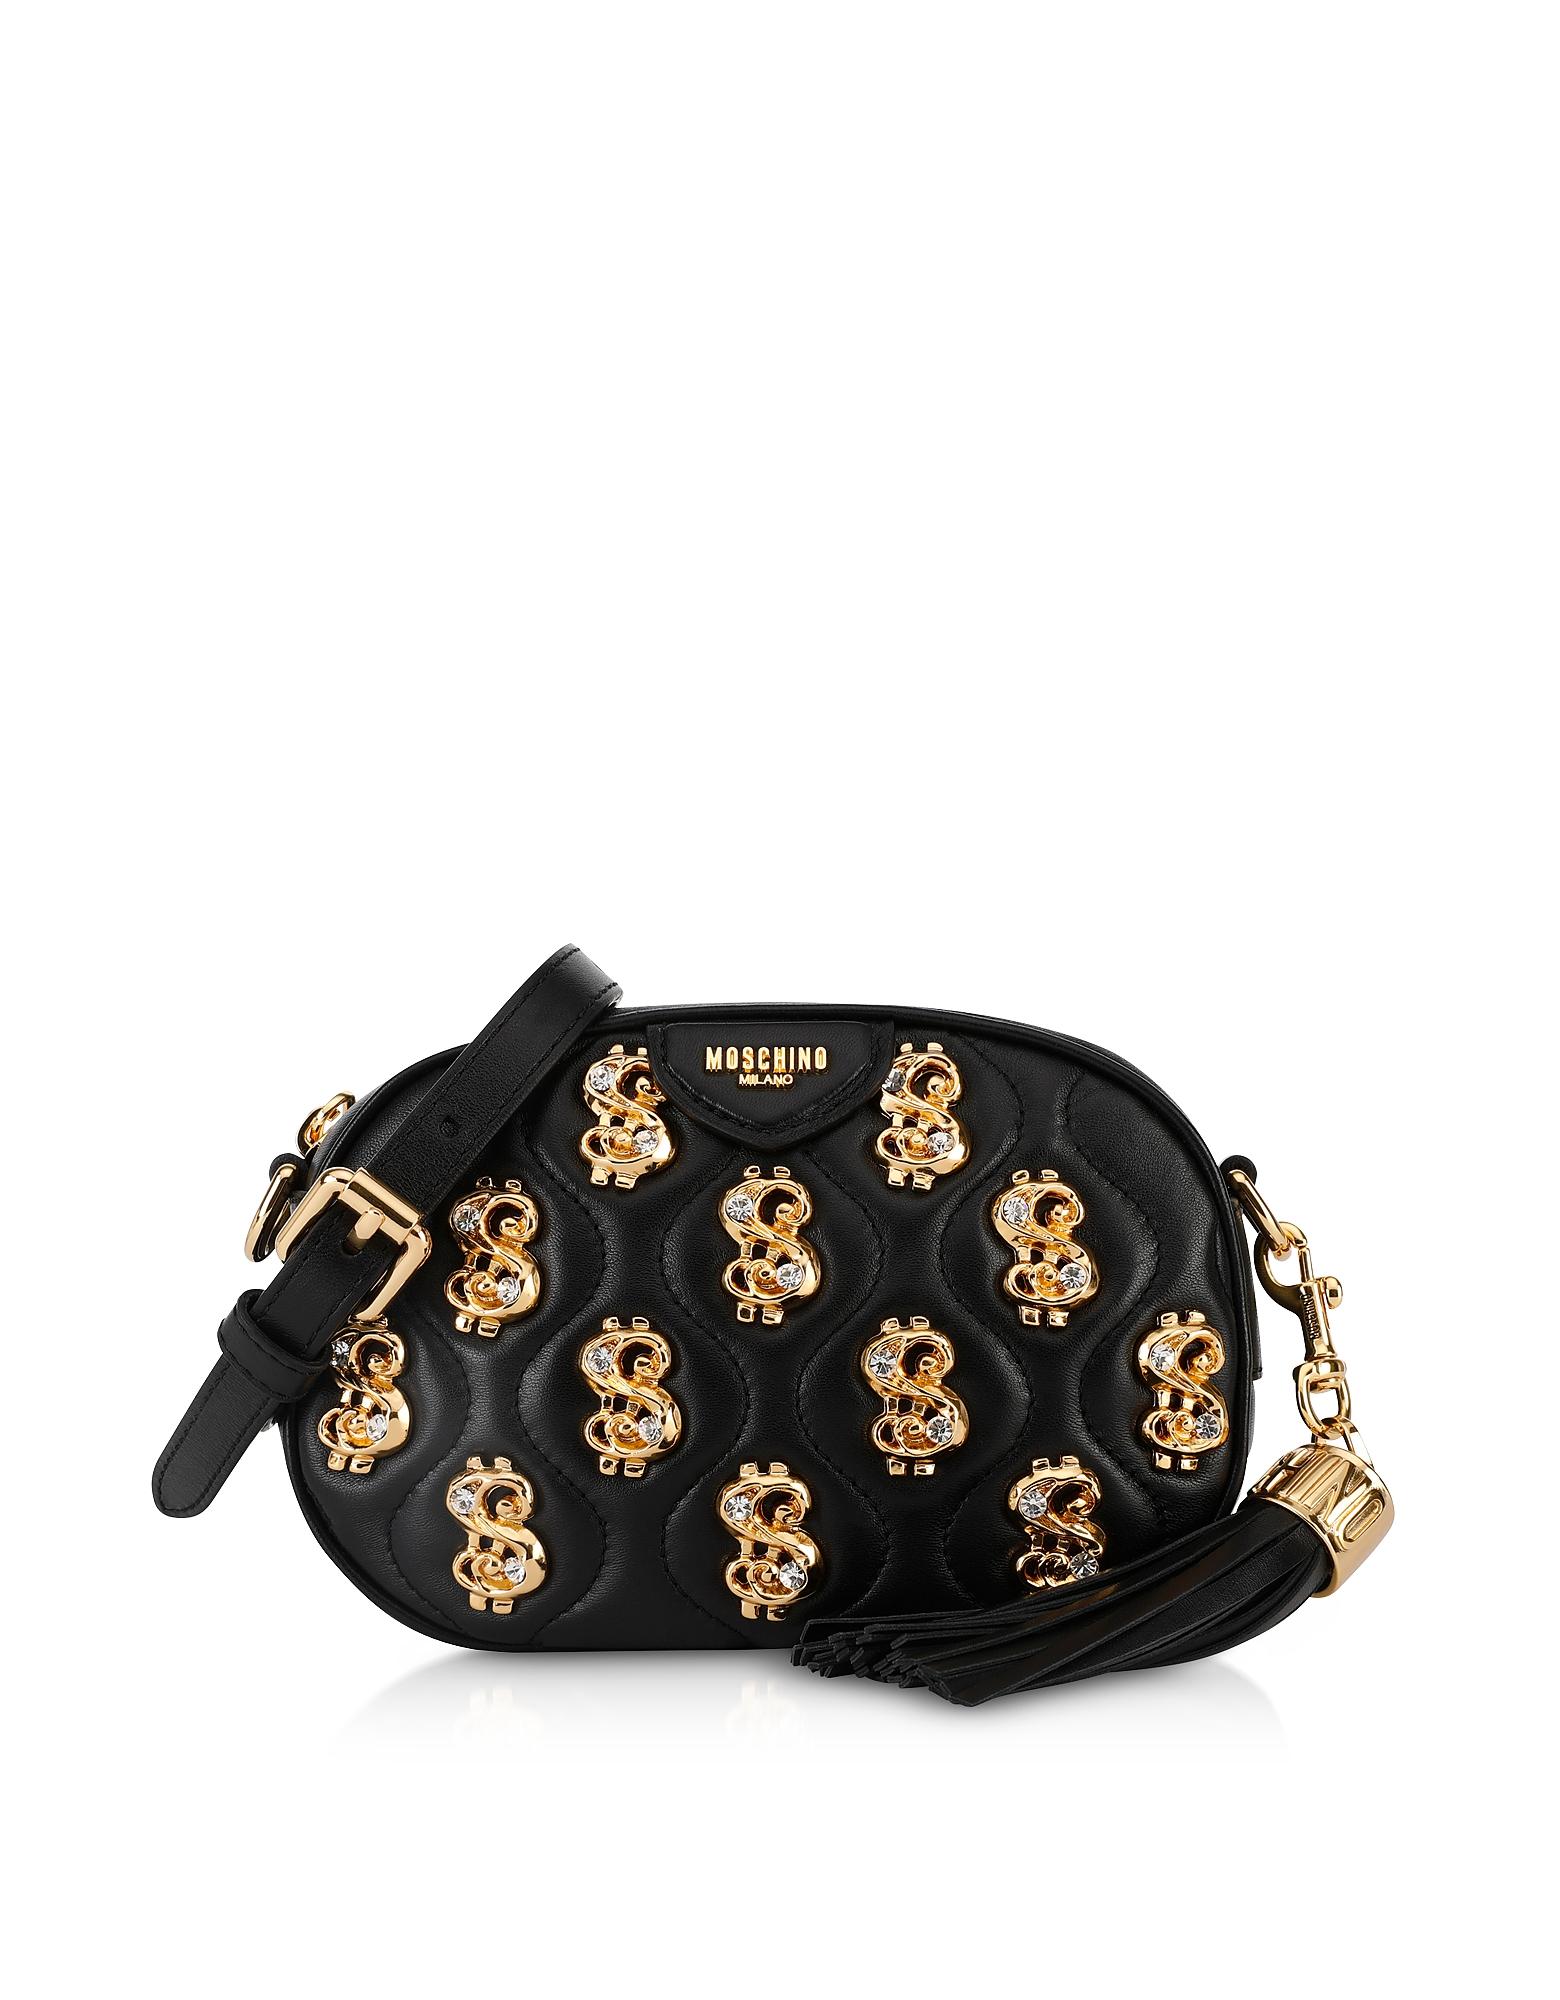 UPC 657536148647 product image for Moschino Designer Handbags, Black Dollars and Crystals Crossbody Bag w/ Tassel | upcitemdb.com